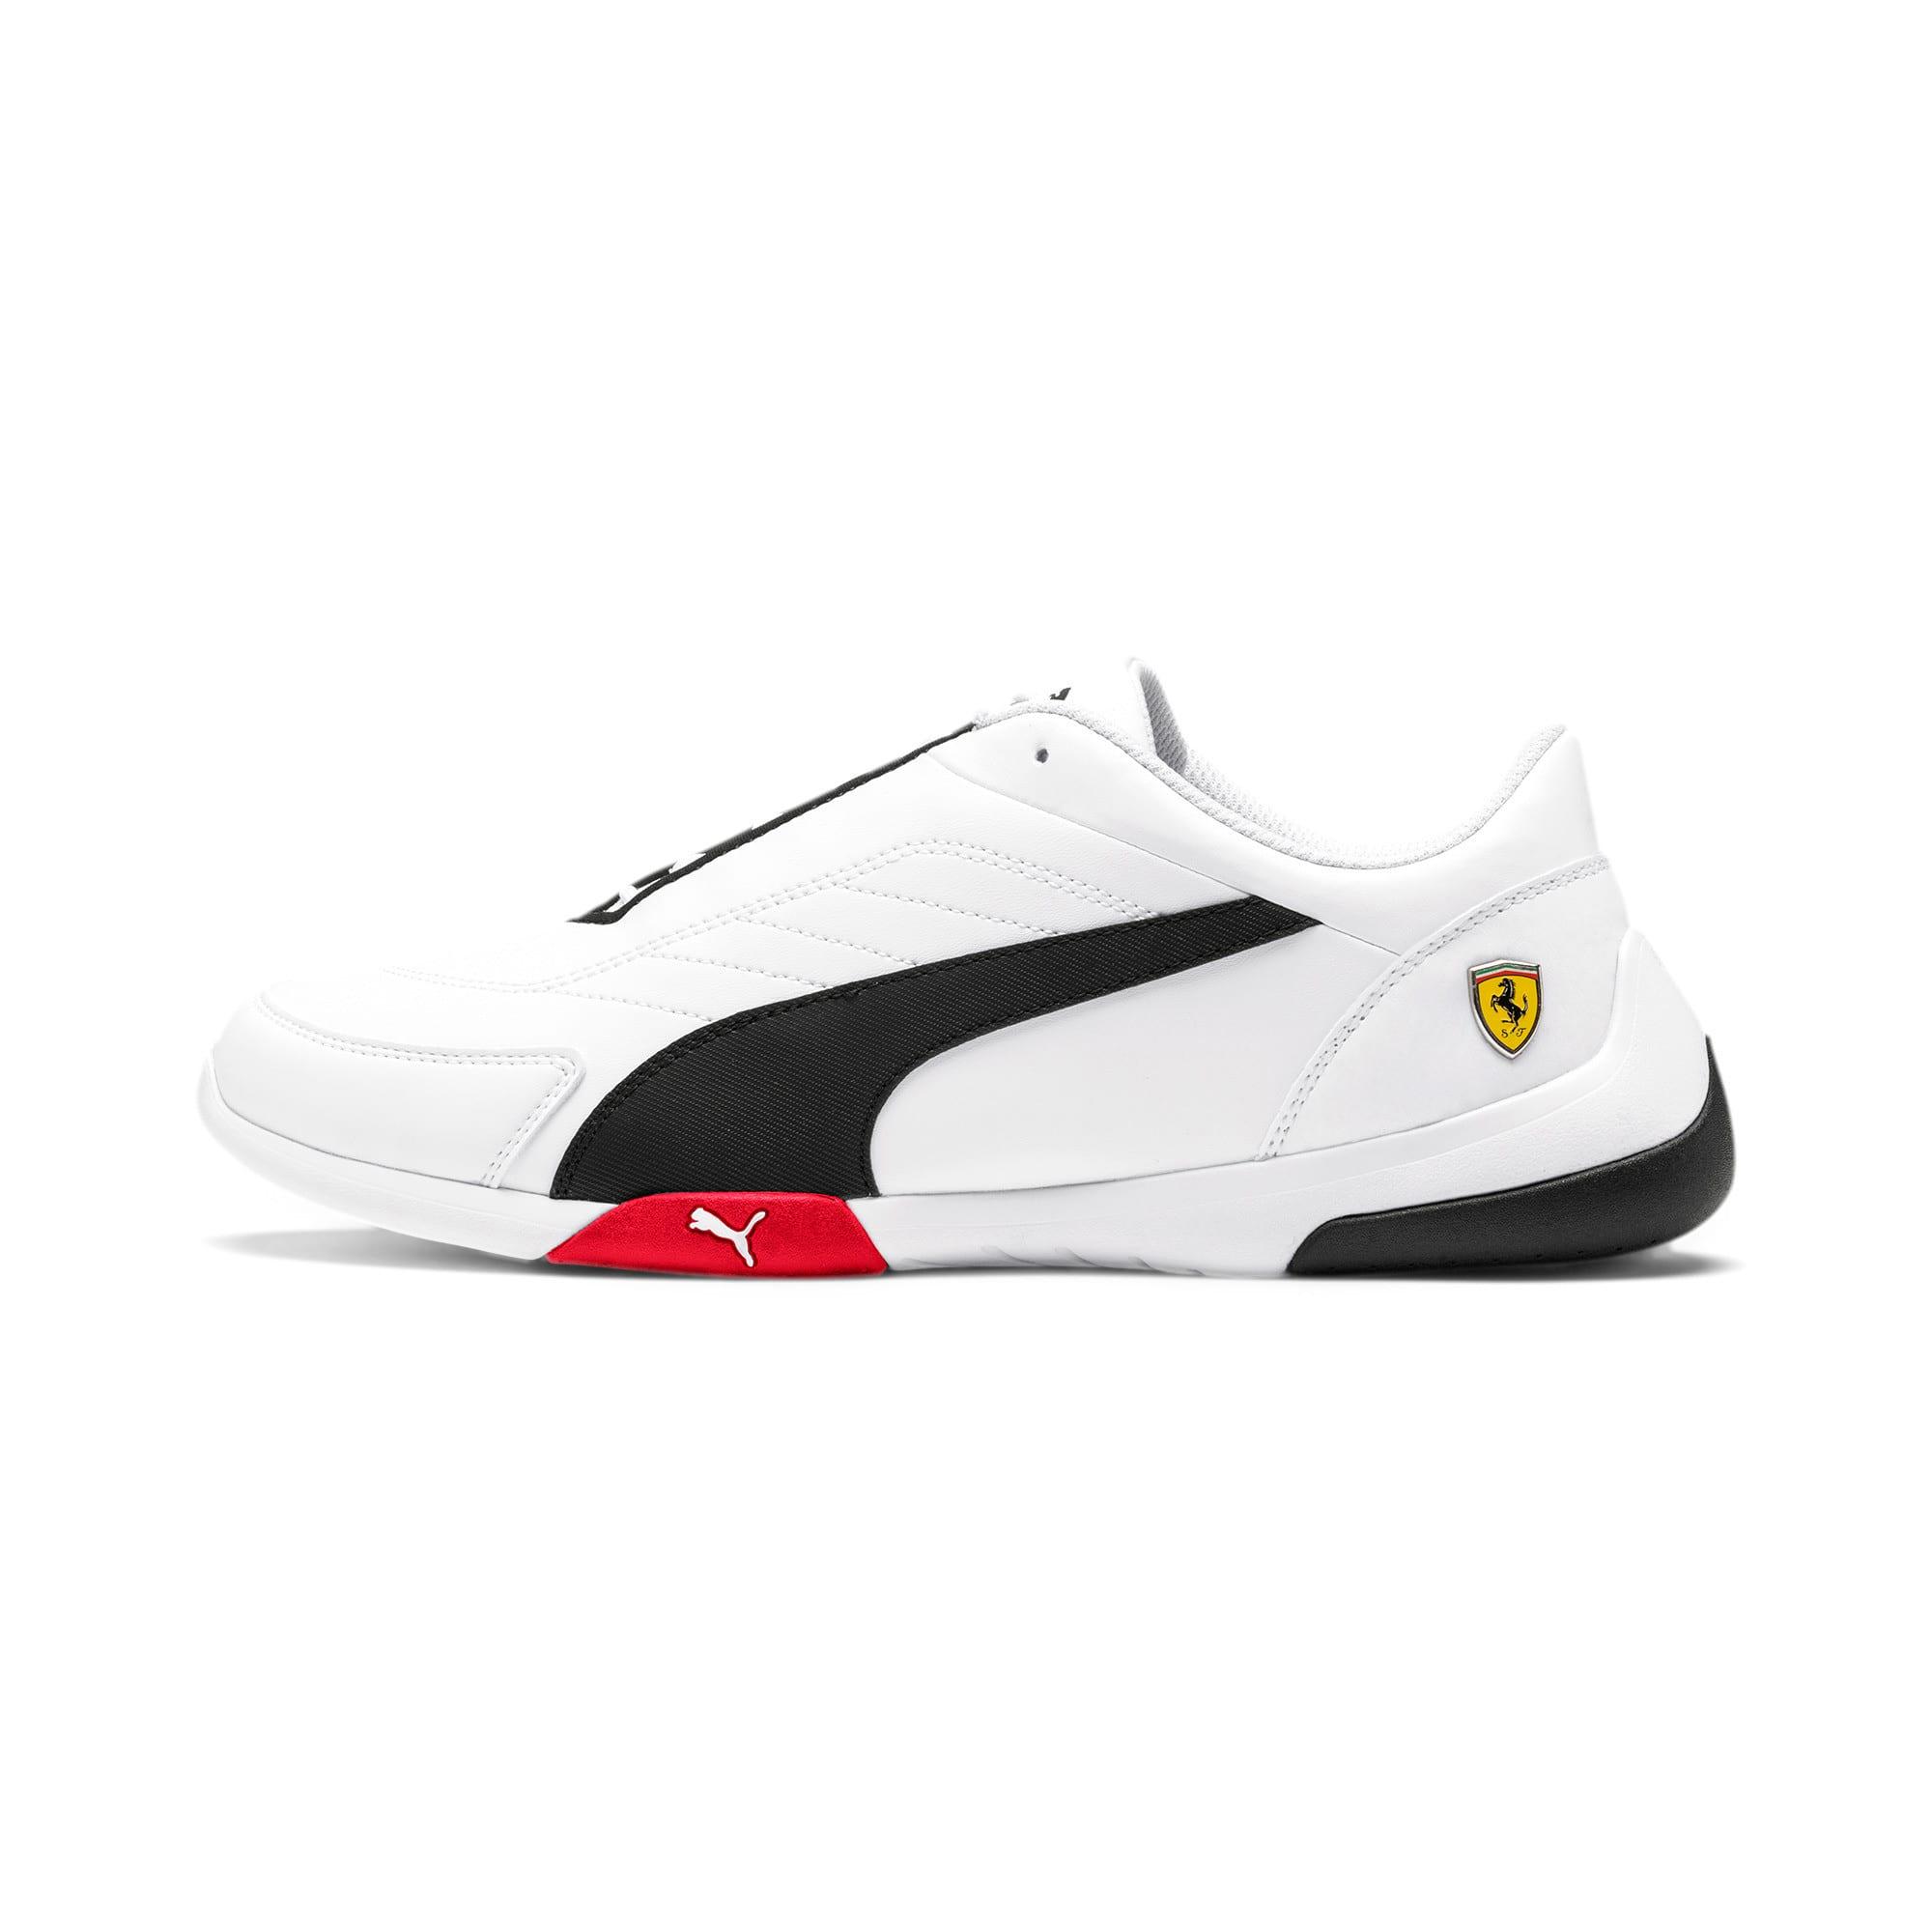 Thumbnail 1 of Scuderia Ferrari Kart Cat III Shoes, White-Black-Rosso Corsa, medium